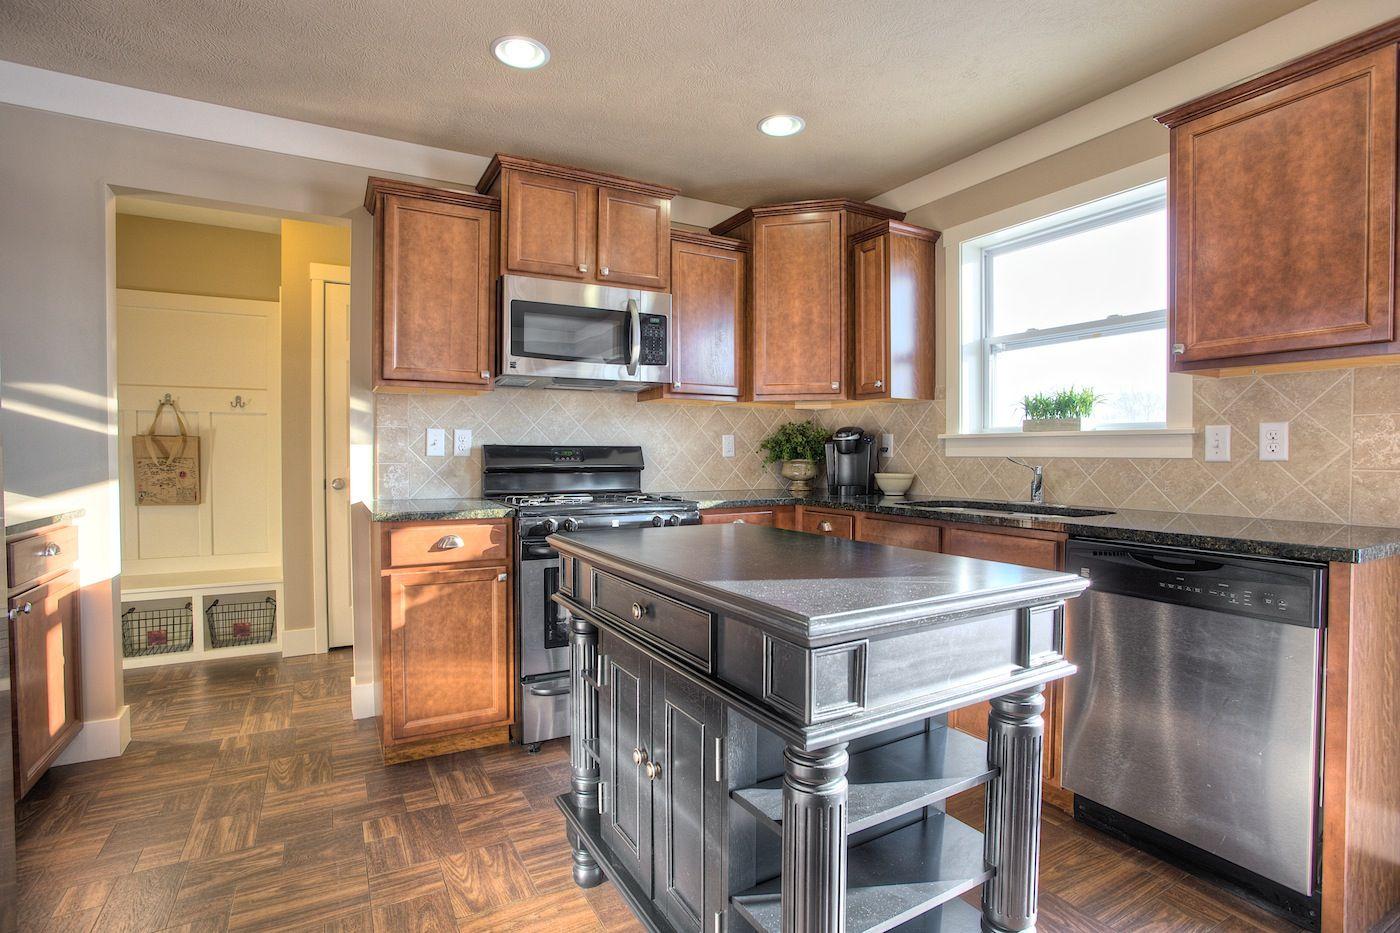 Kitchen featured in the Elements 1870 By Allen Edwin Homes in Benton Harbor, MI